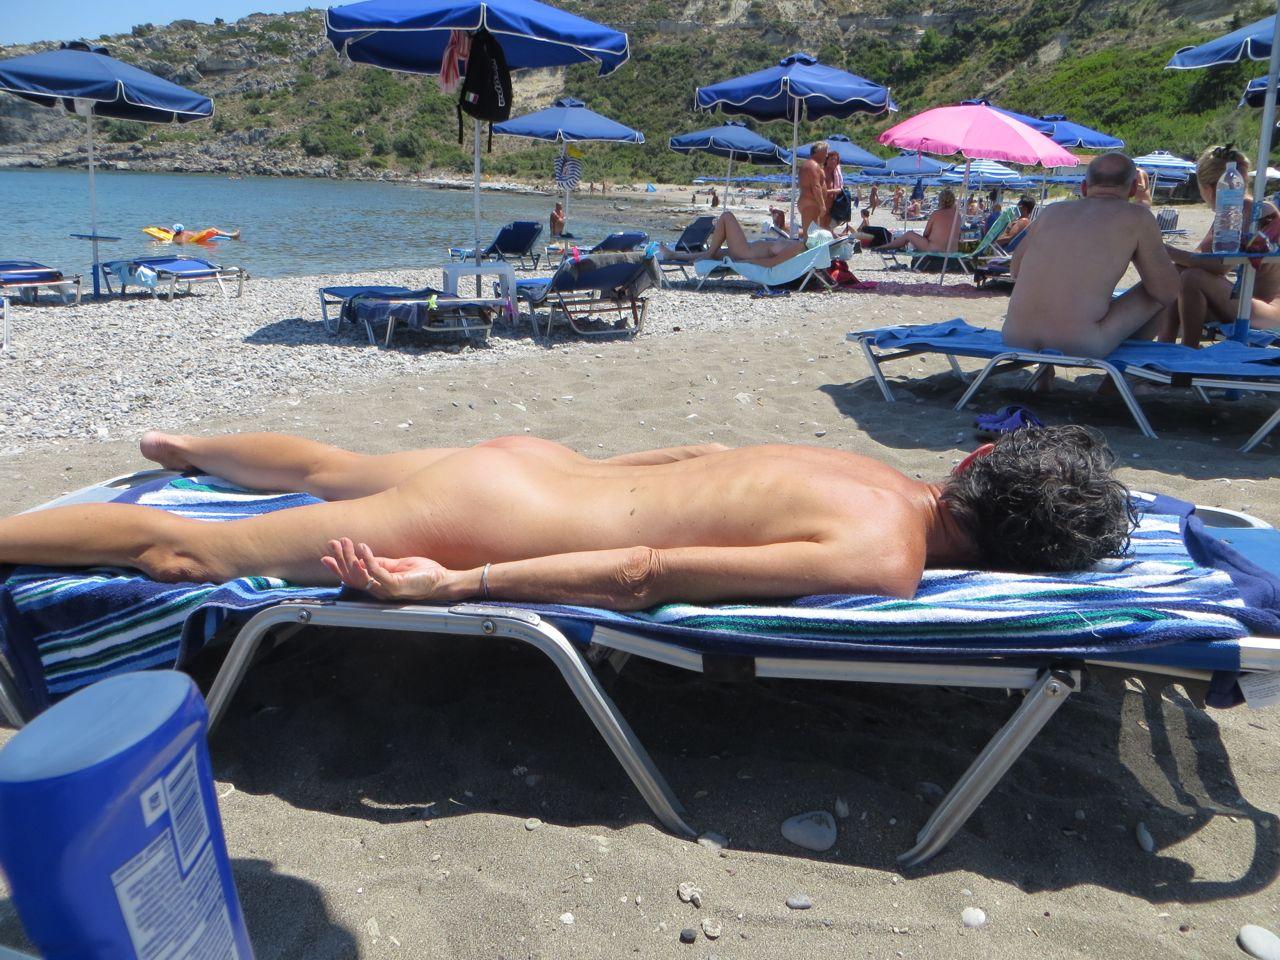 South american nude beaches sex, naked hyderabadi girl